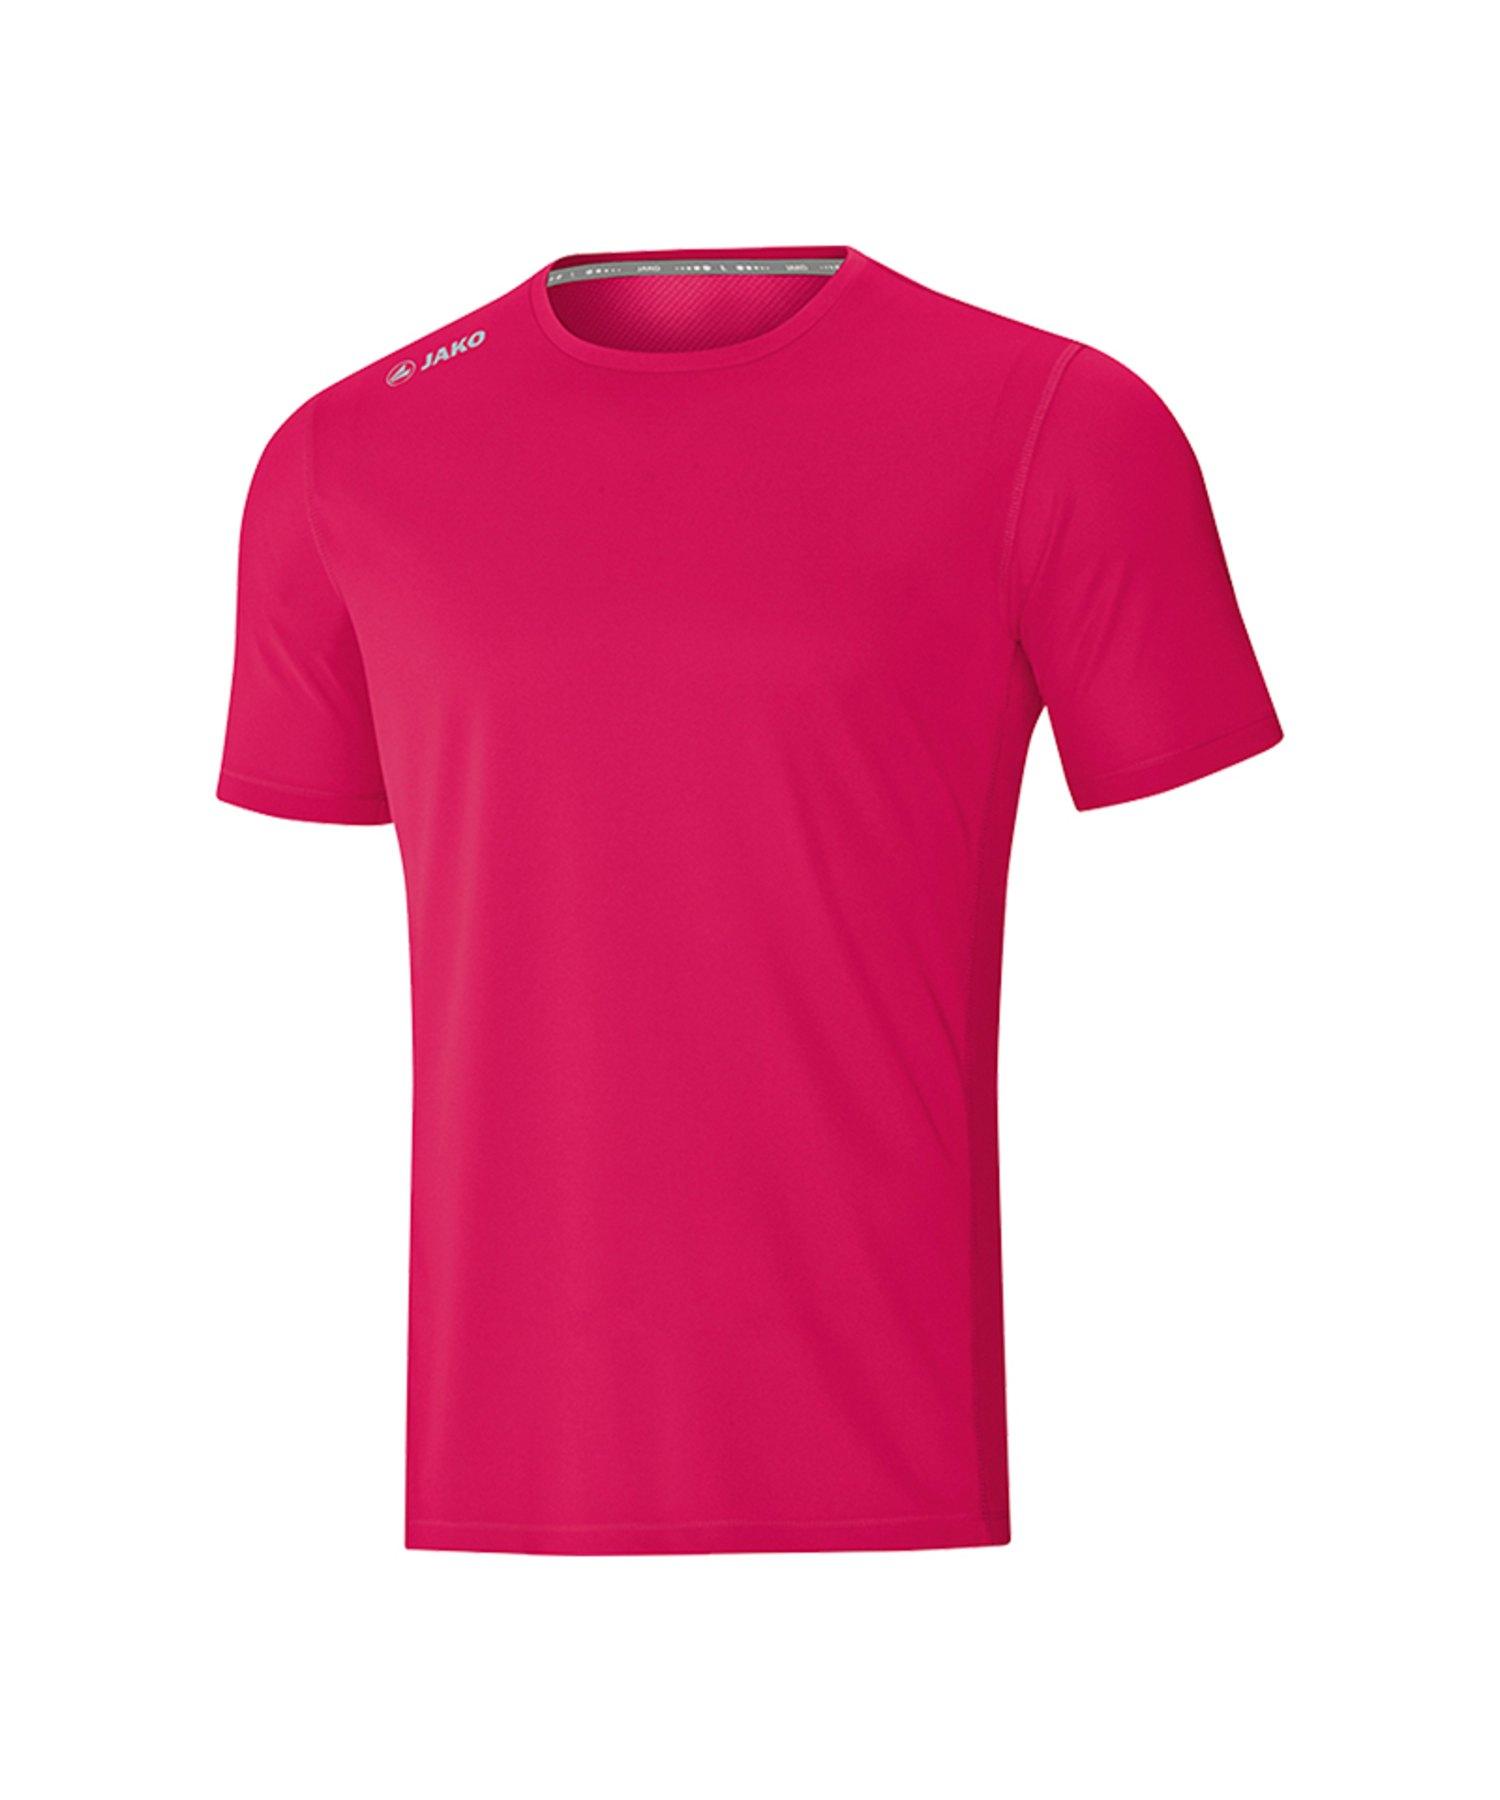 Jako Run 2.0 T-Shirt Running Kids Pink F51 - Pink